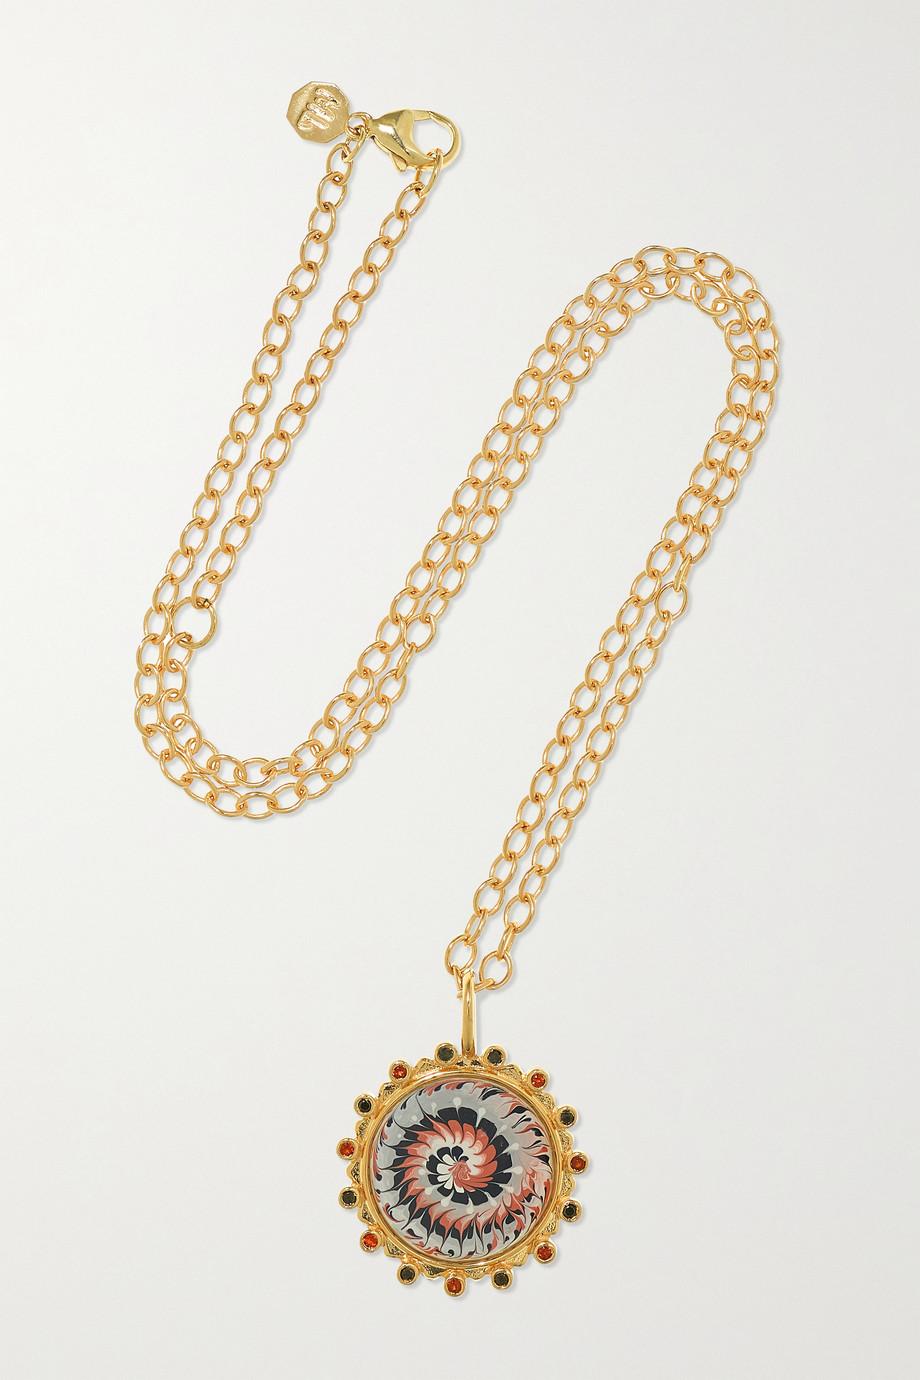 Marlo Laz Tie Dye 14-karat gold, enamel, garnet and diamond necklace